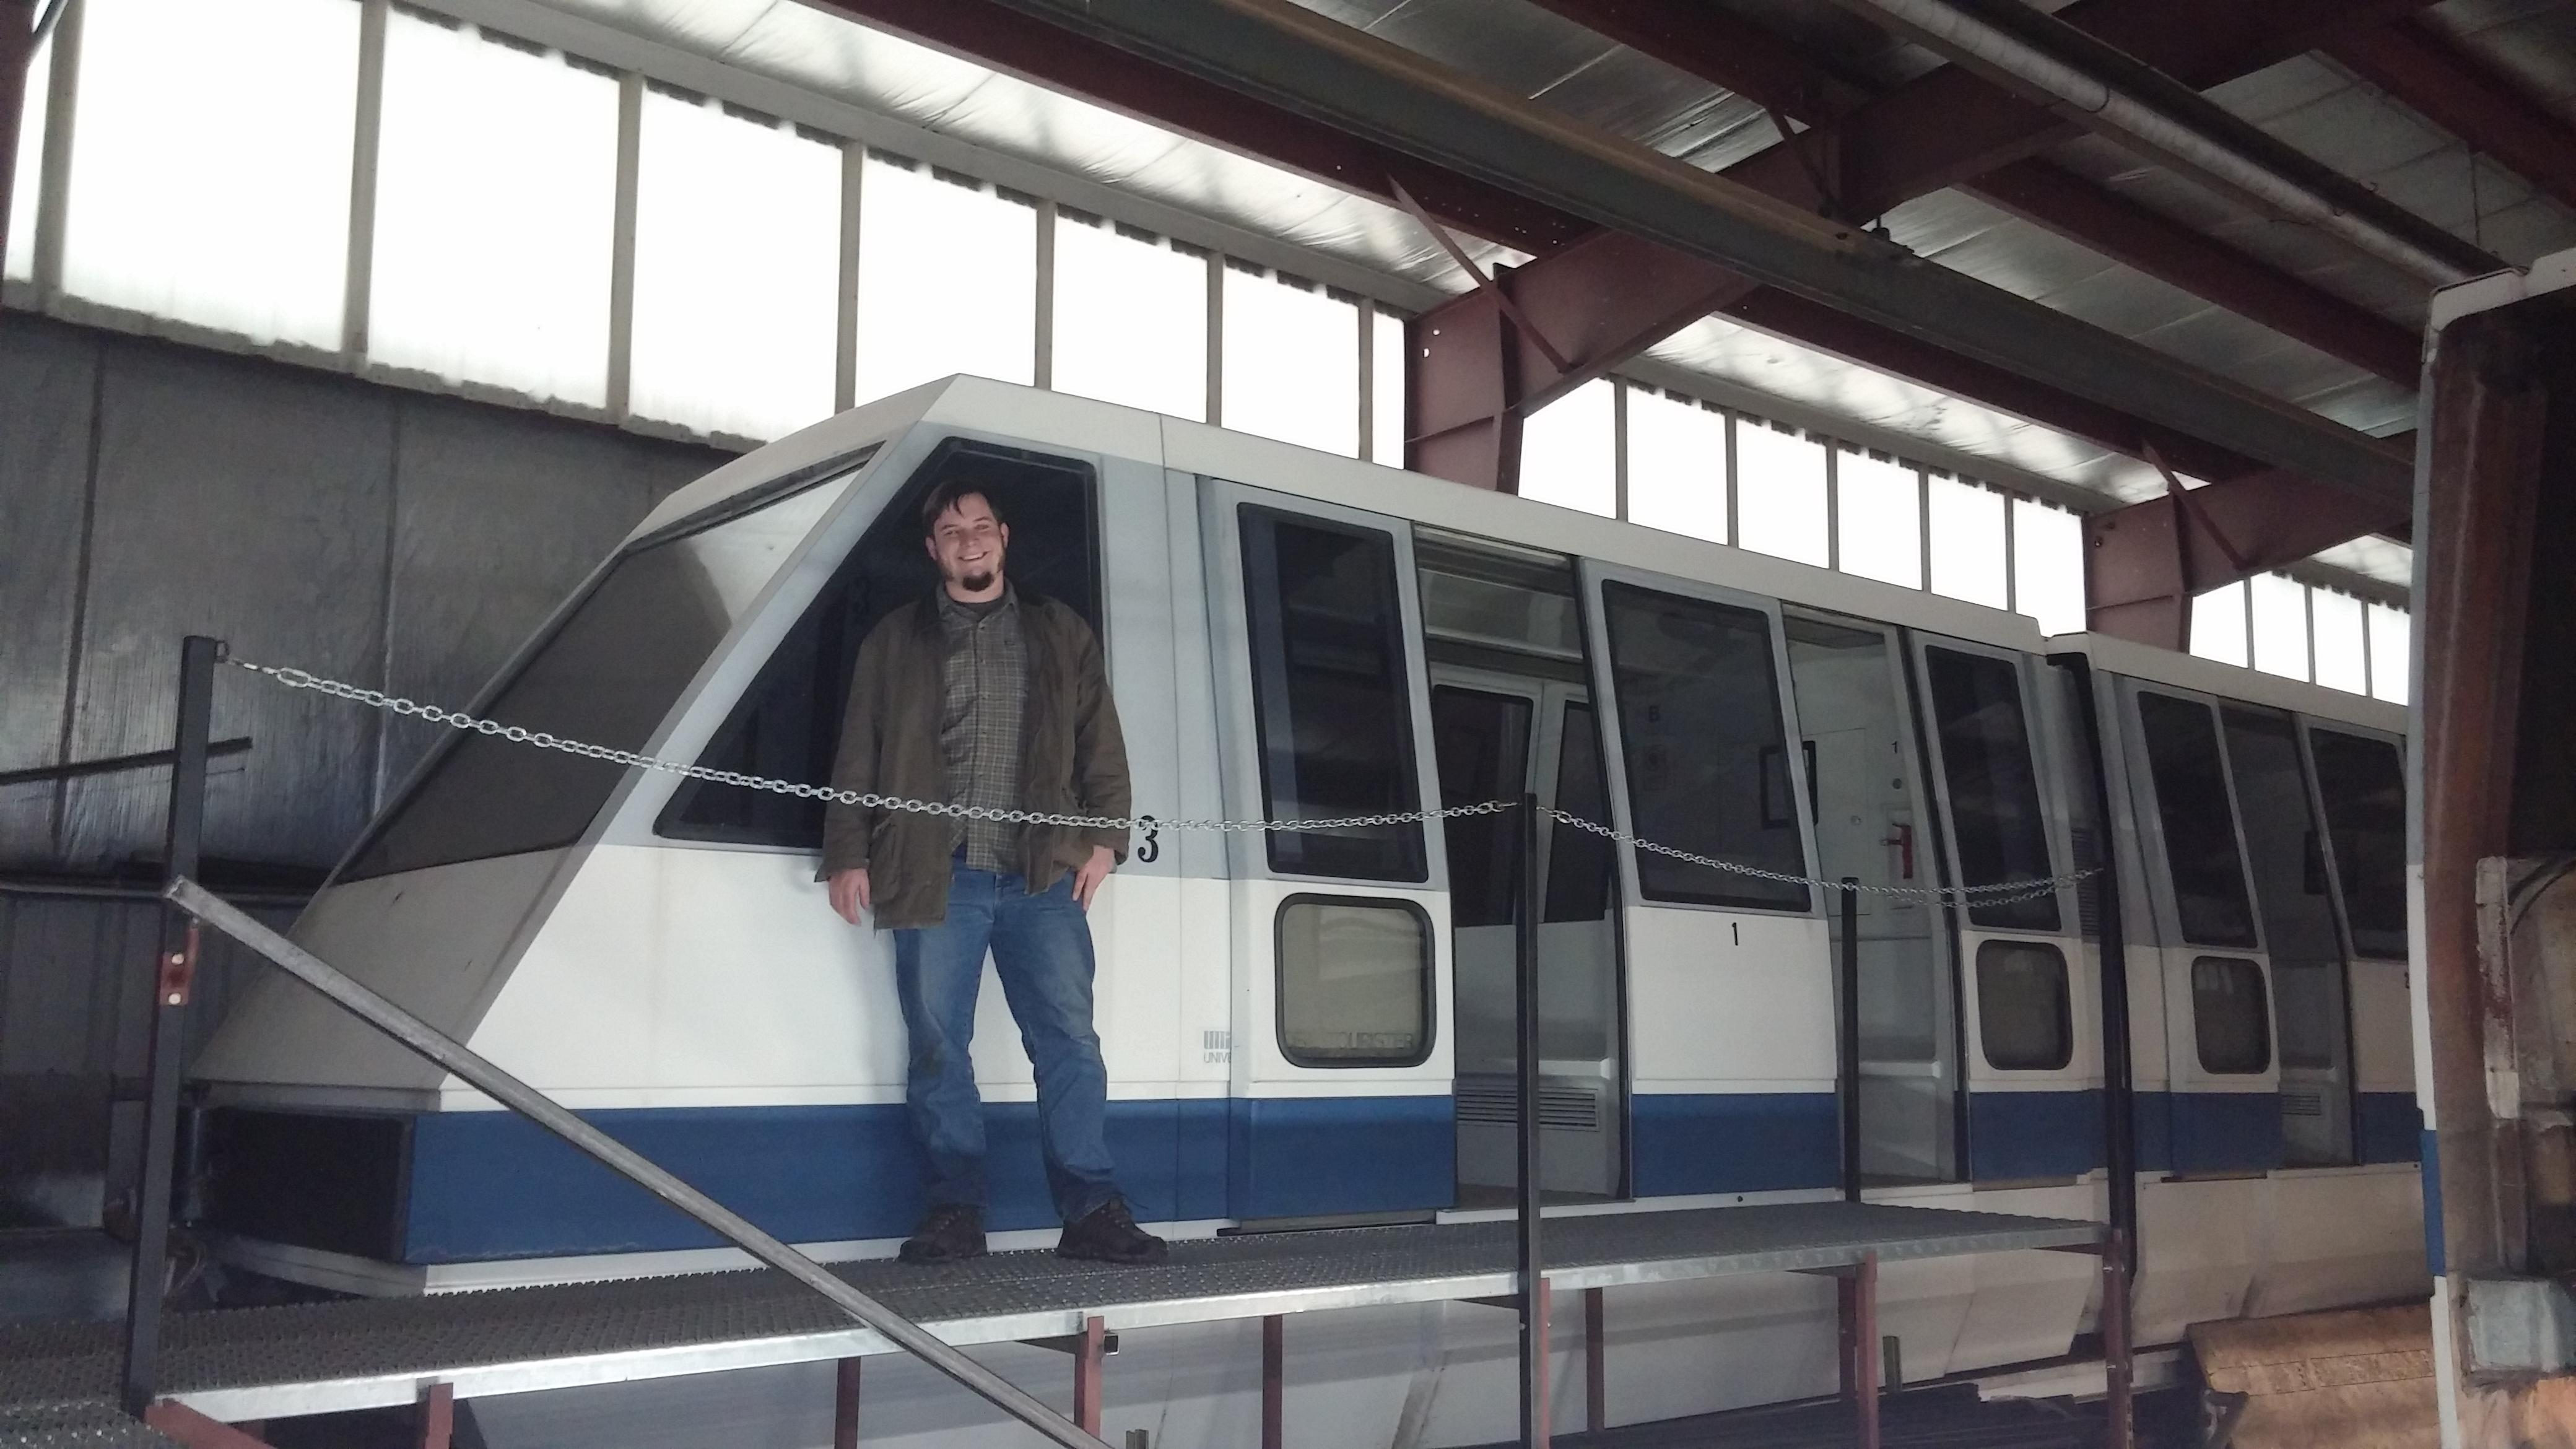 the purchase of a genuine bona fide electrified six car monorail